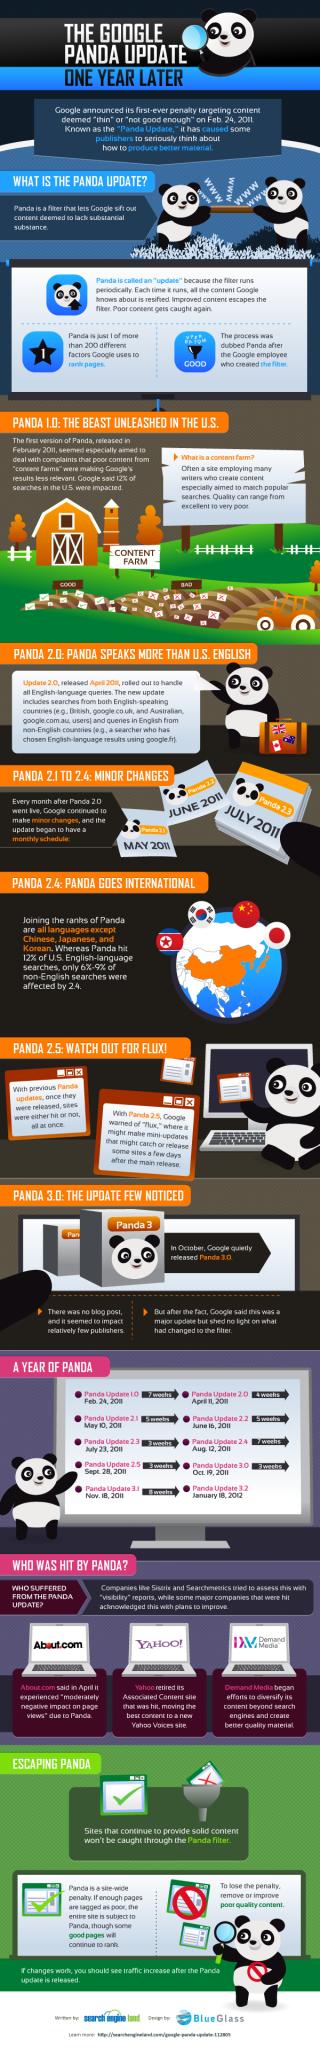 Google Panda Infographic from SearchEngineLand.com